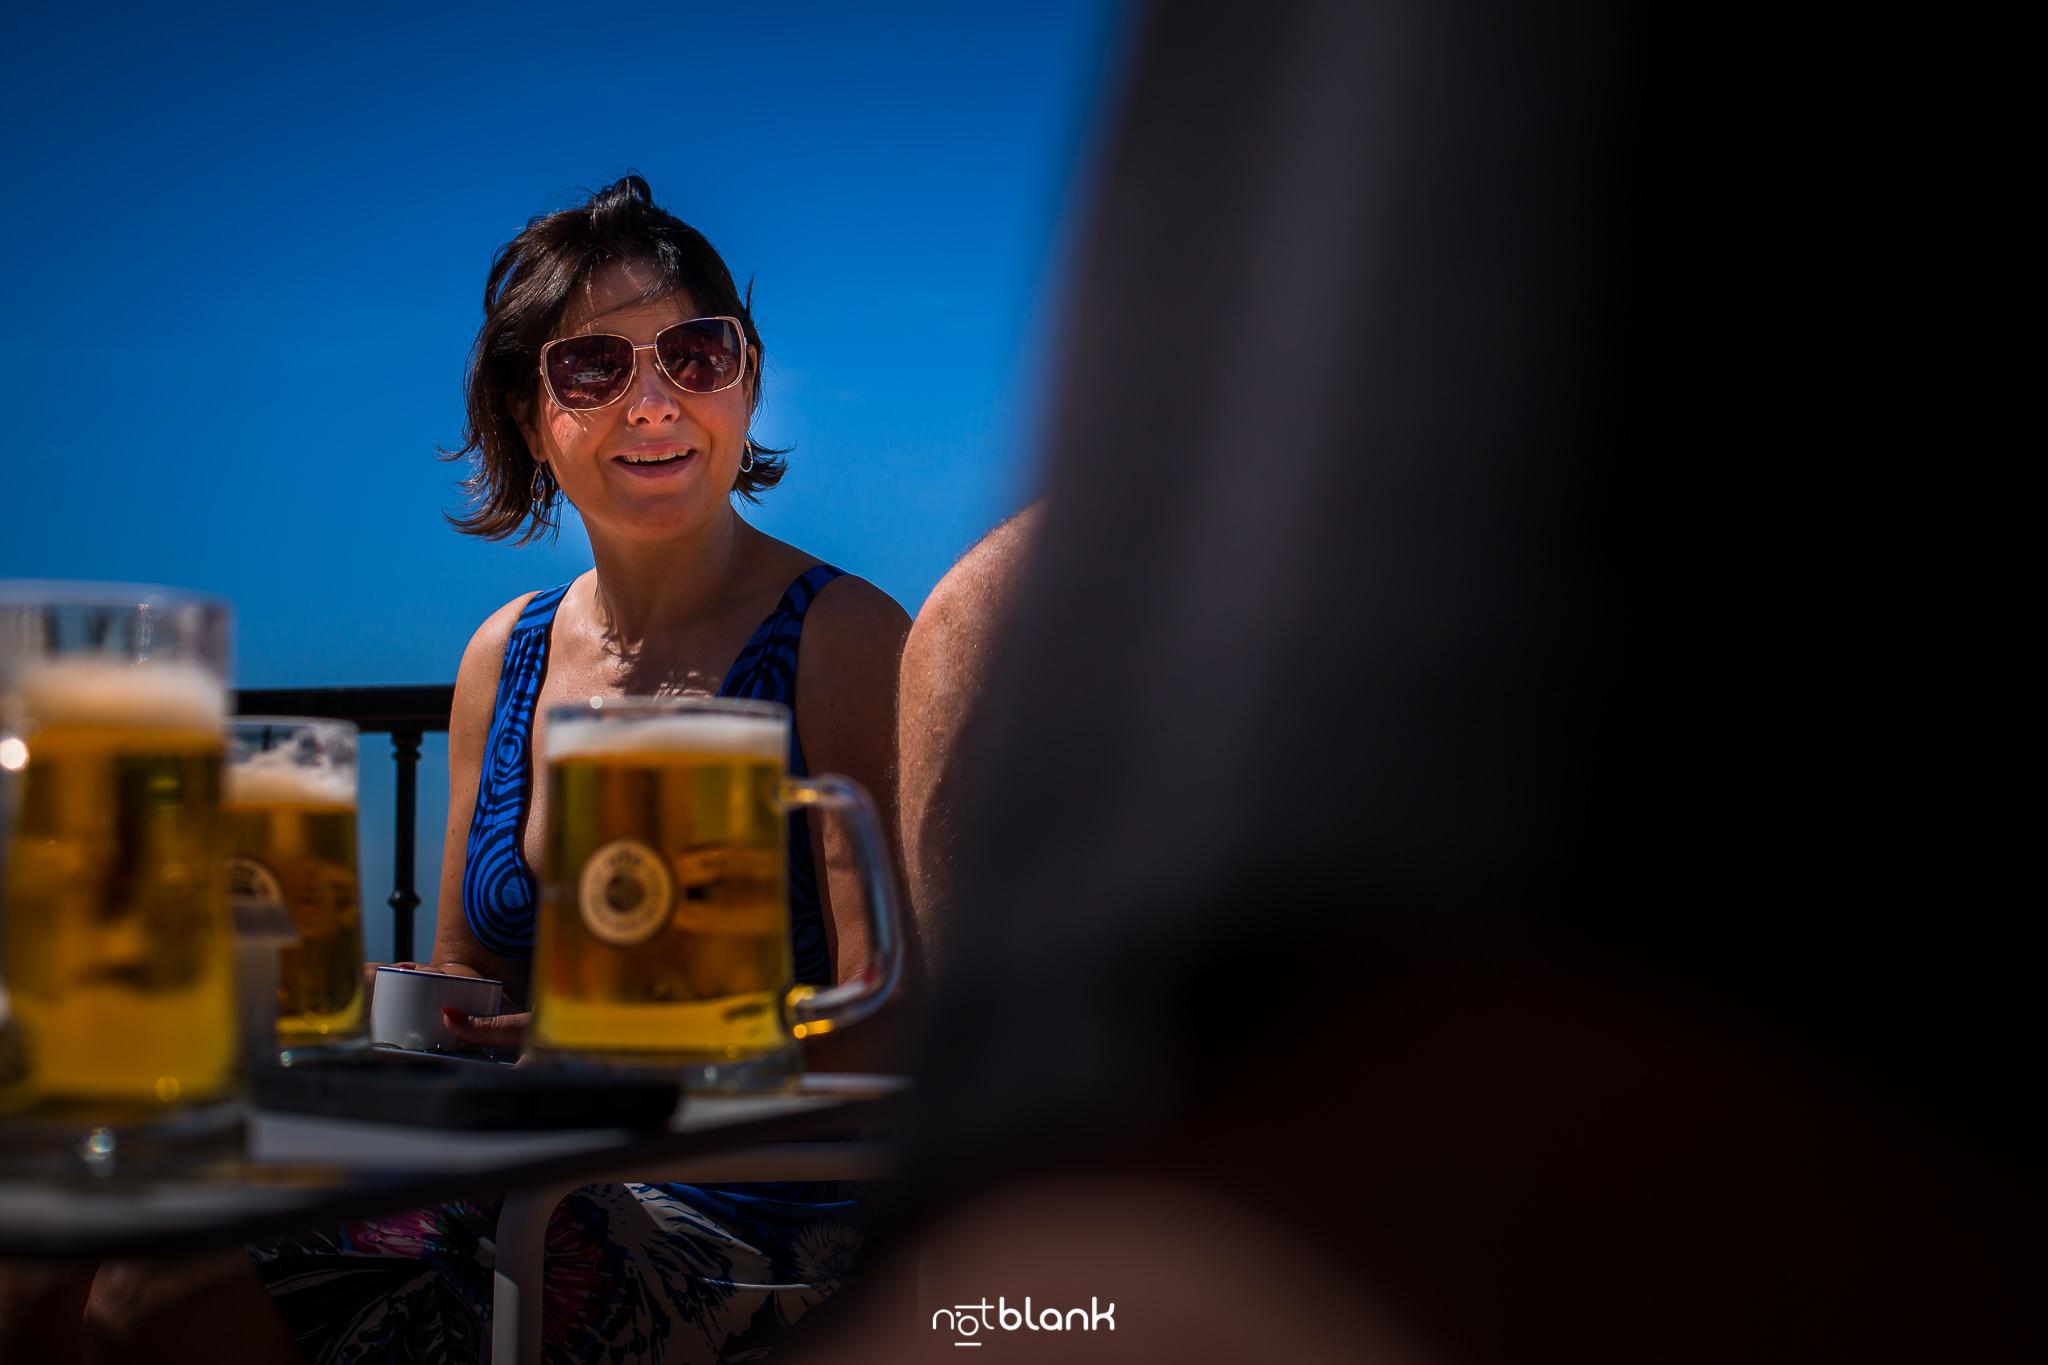 Boda-Maite-David-Terraza-Hotel-Talaso-Atlantico-Invitada-Tomando-Cerveza. Reportaje realizado por Notblank fotógrafos de boda